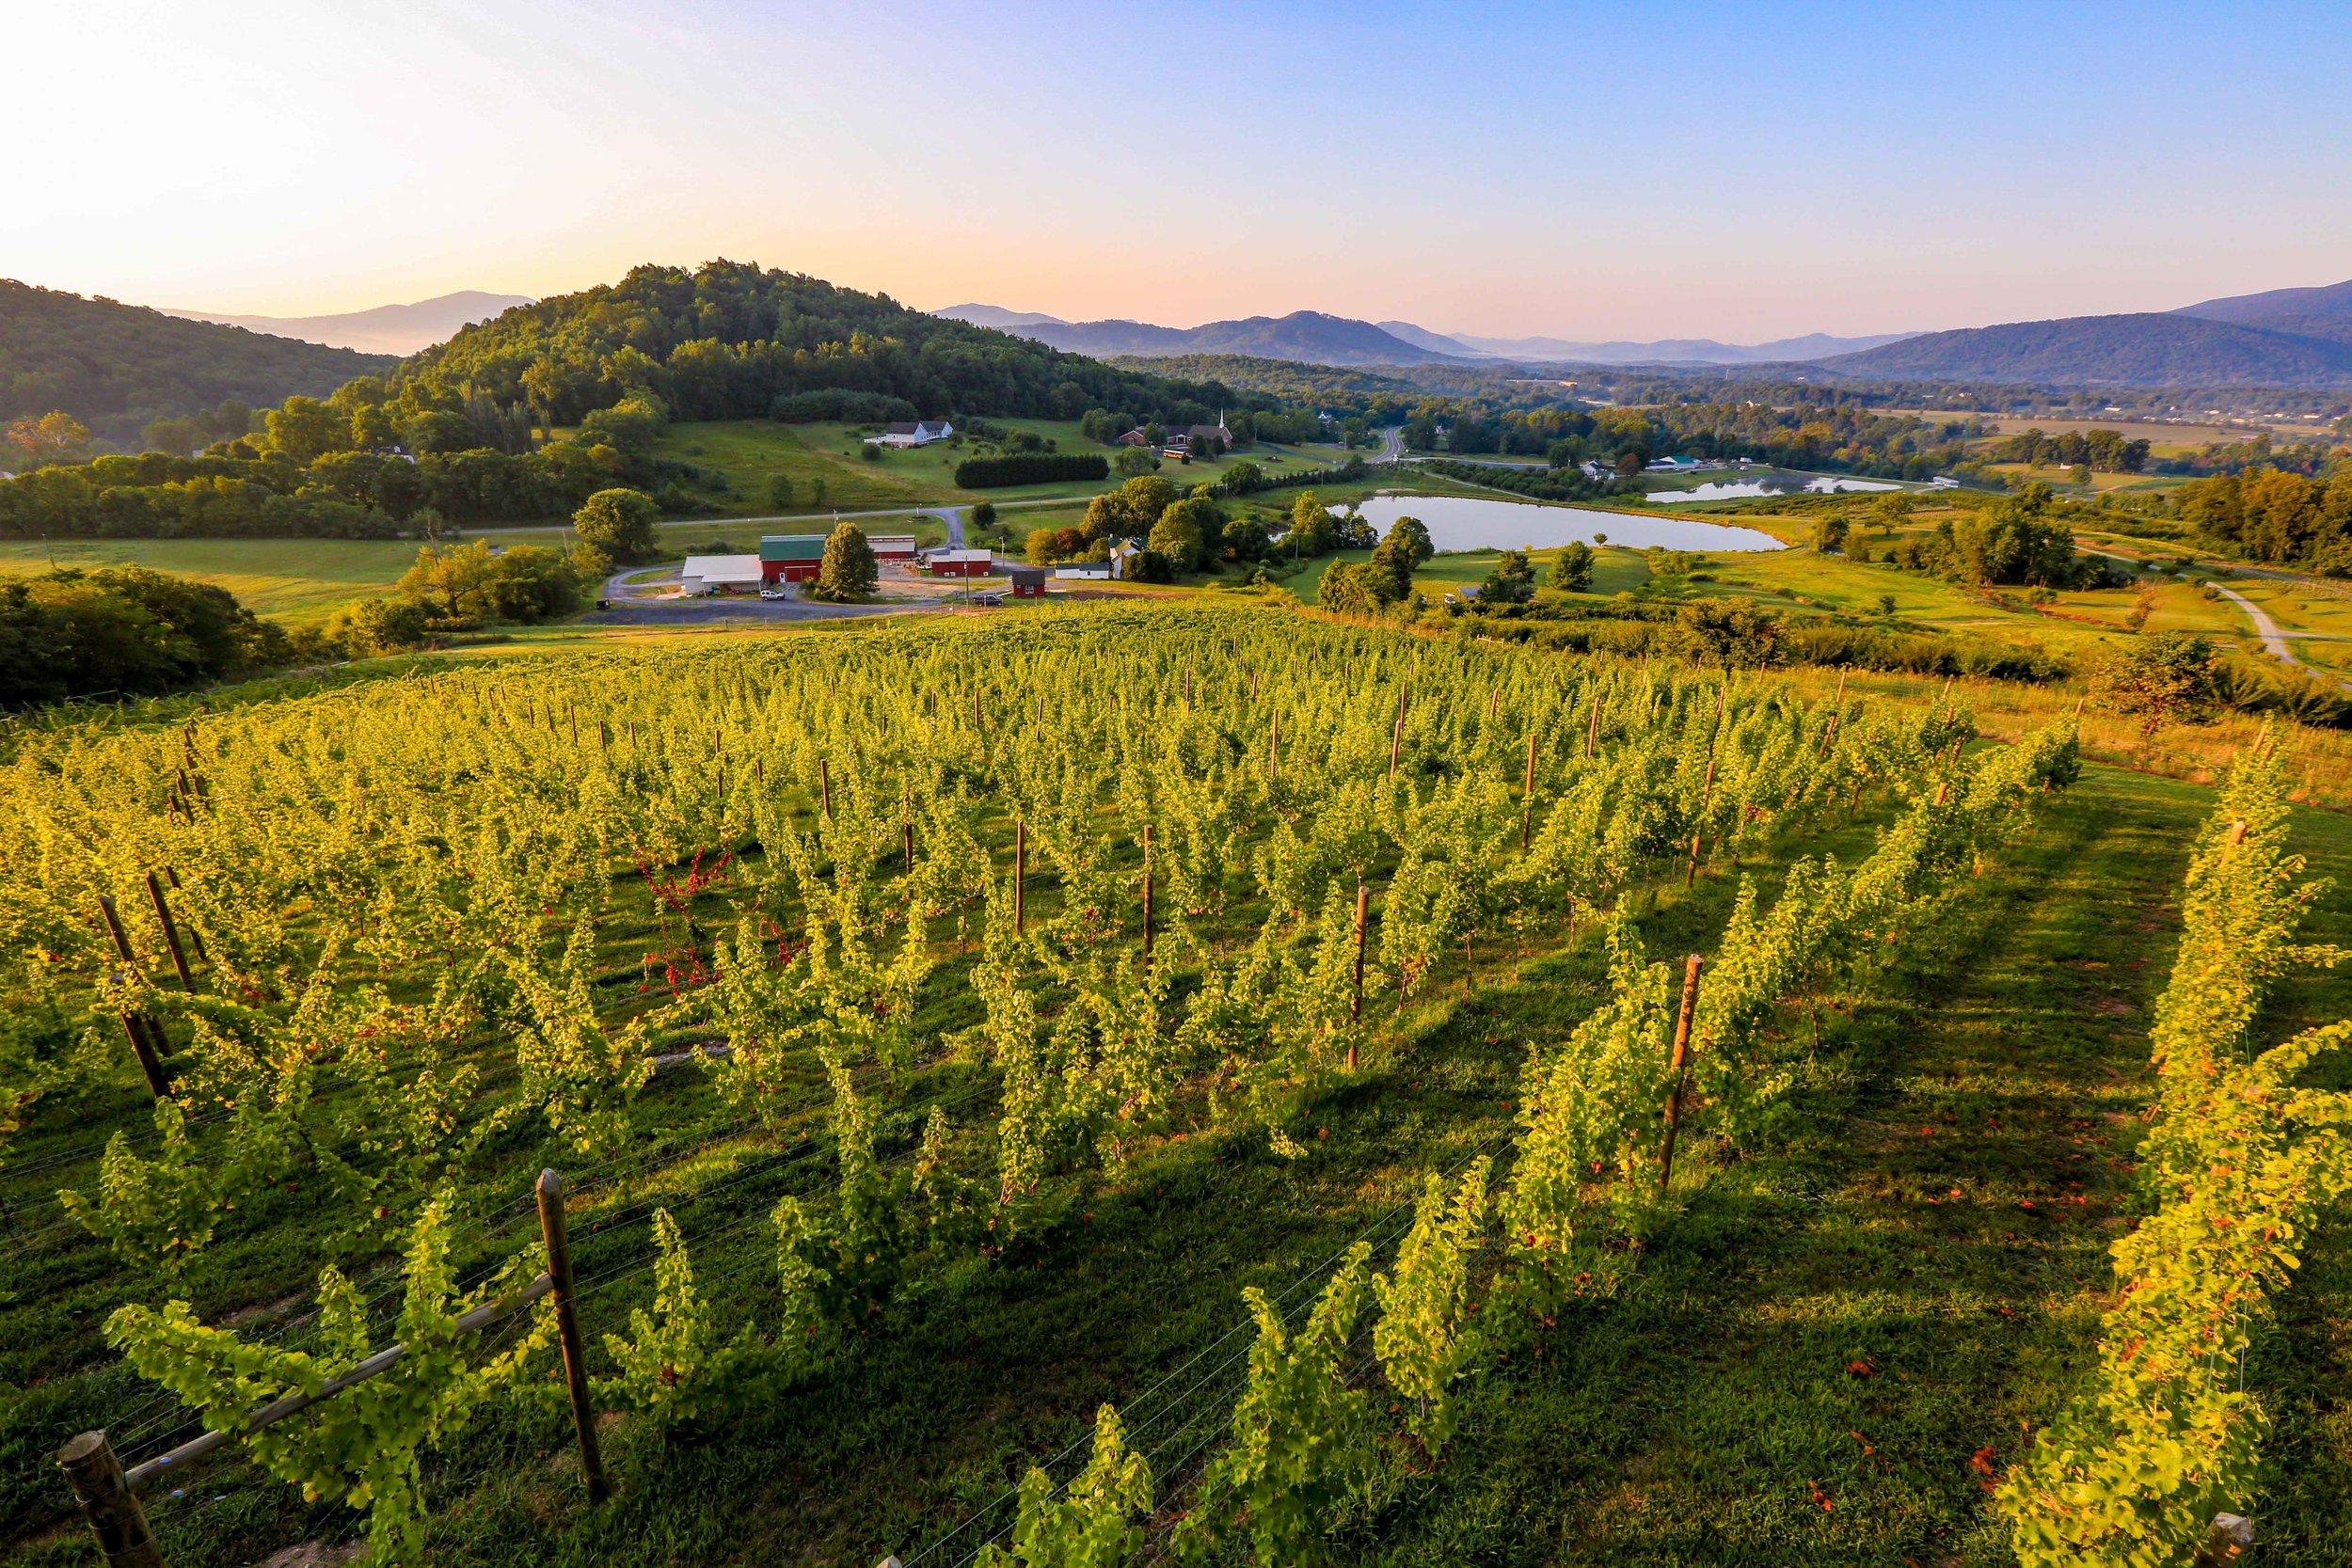 170820-vrv-stock-vineyard-0074-300dpi.jpg